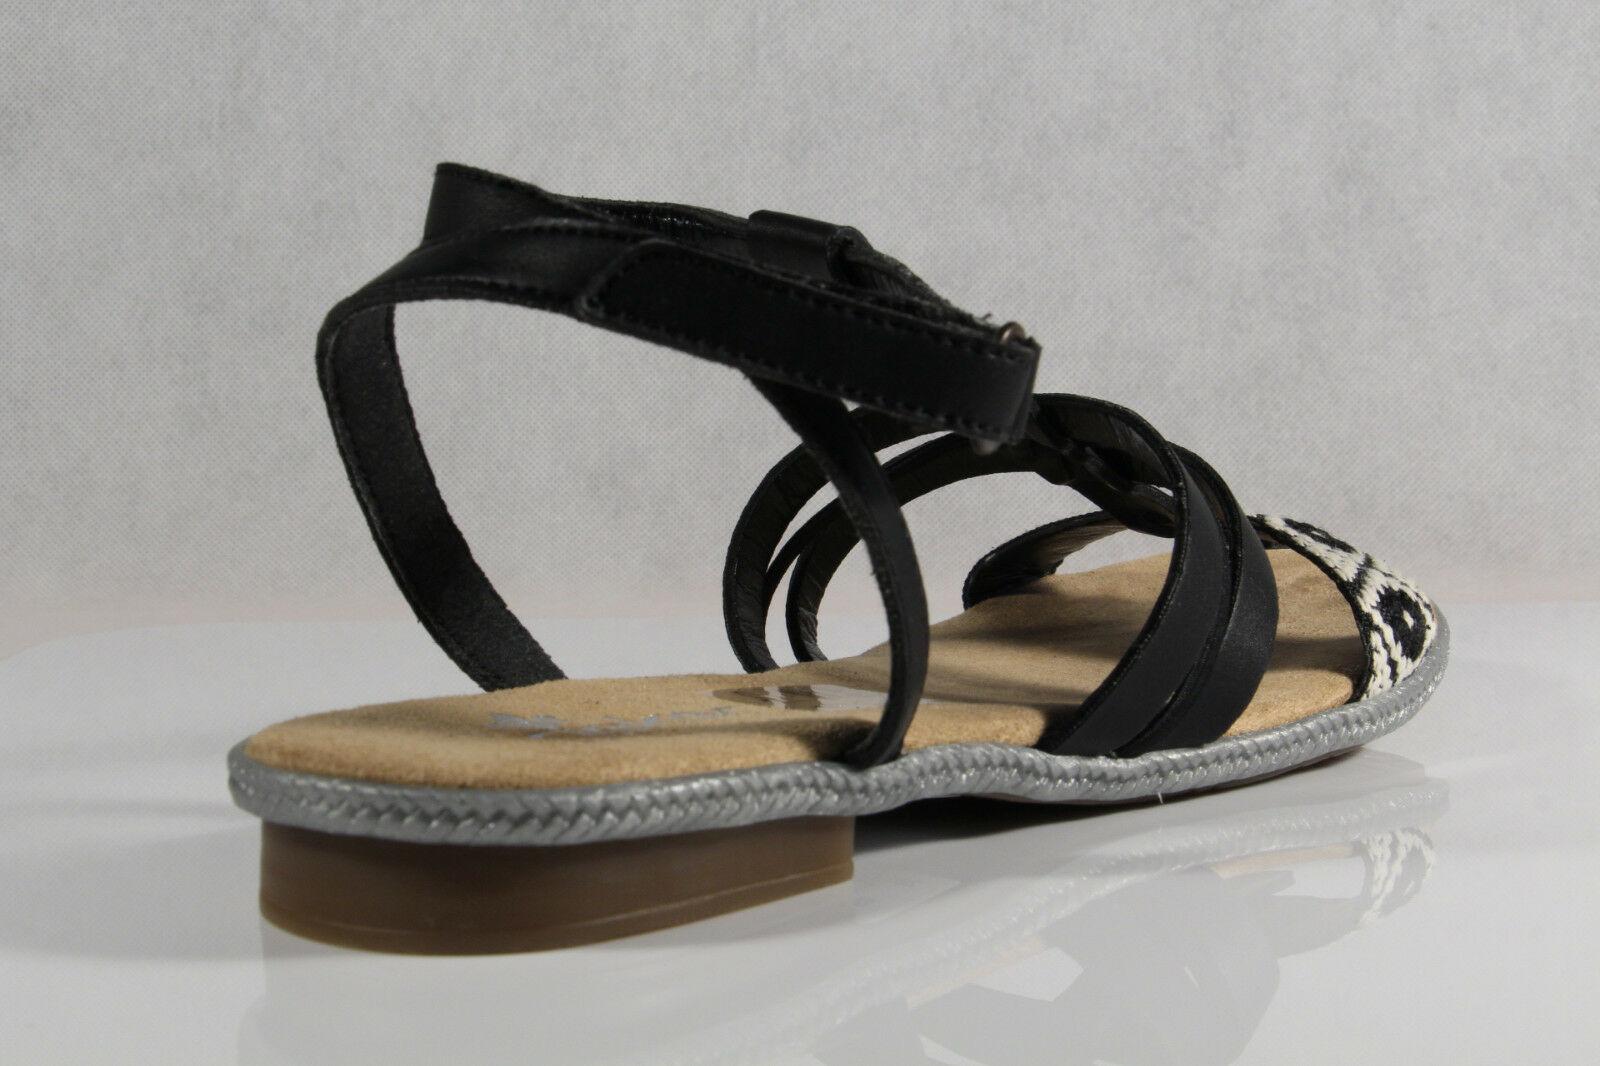 Rieker Damen Sandalen Sandaletten Sandale schwarz 62736 KV n5qRc